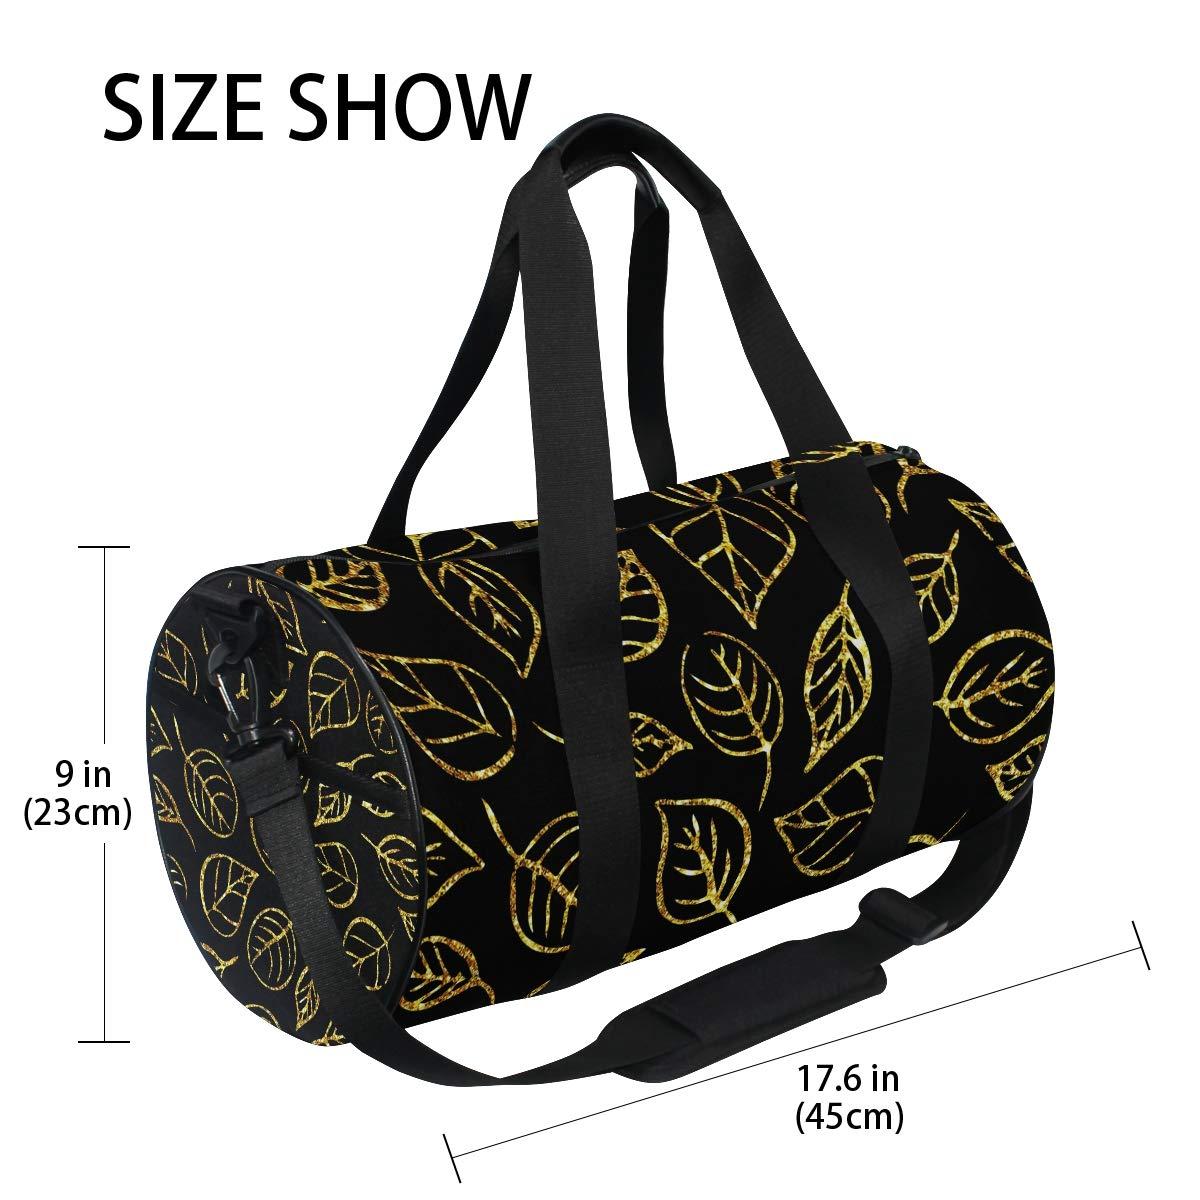 Sports Gym Duffel Barrel Bag Golden Leaves Pattern Travel Luggage Handbag for Men Women